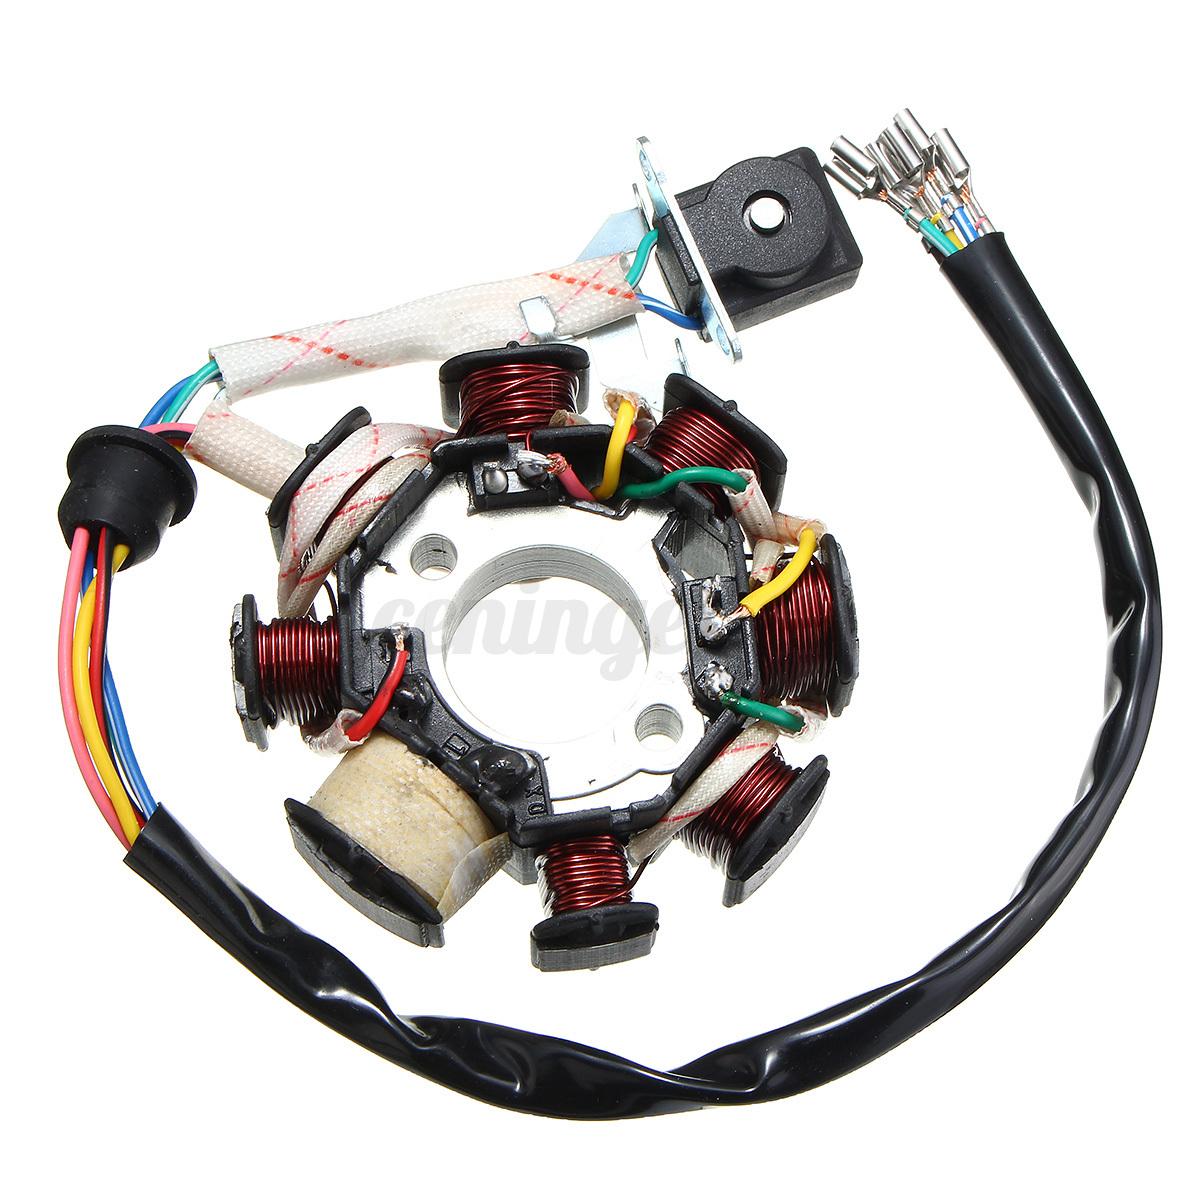 hight resolution of pit bike wiring diagram cc images coolster atv solenoid wiring diagram 110 atv wiring schematics